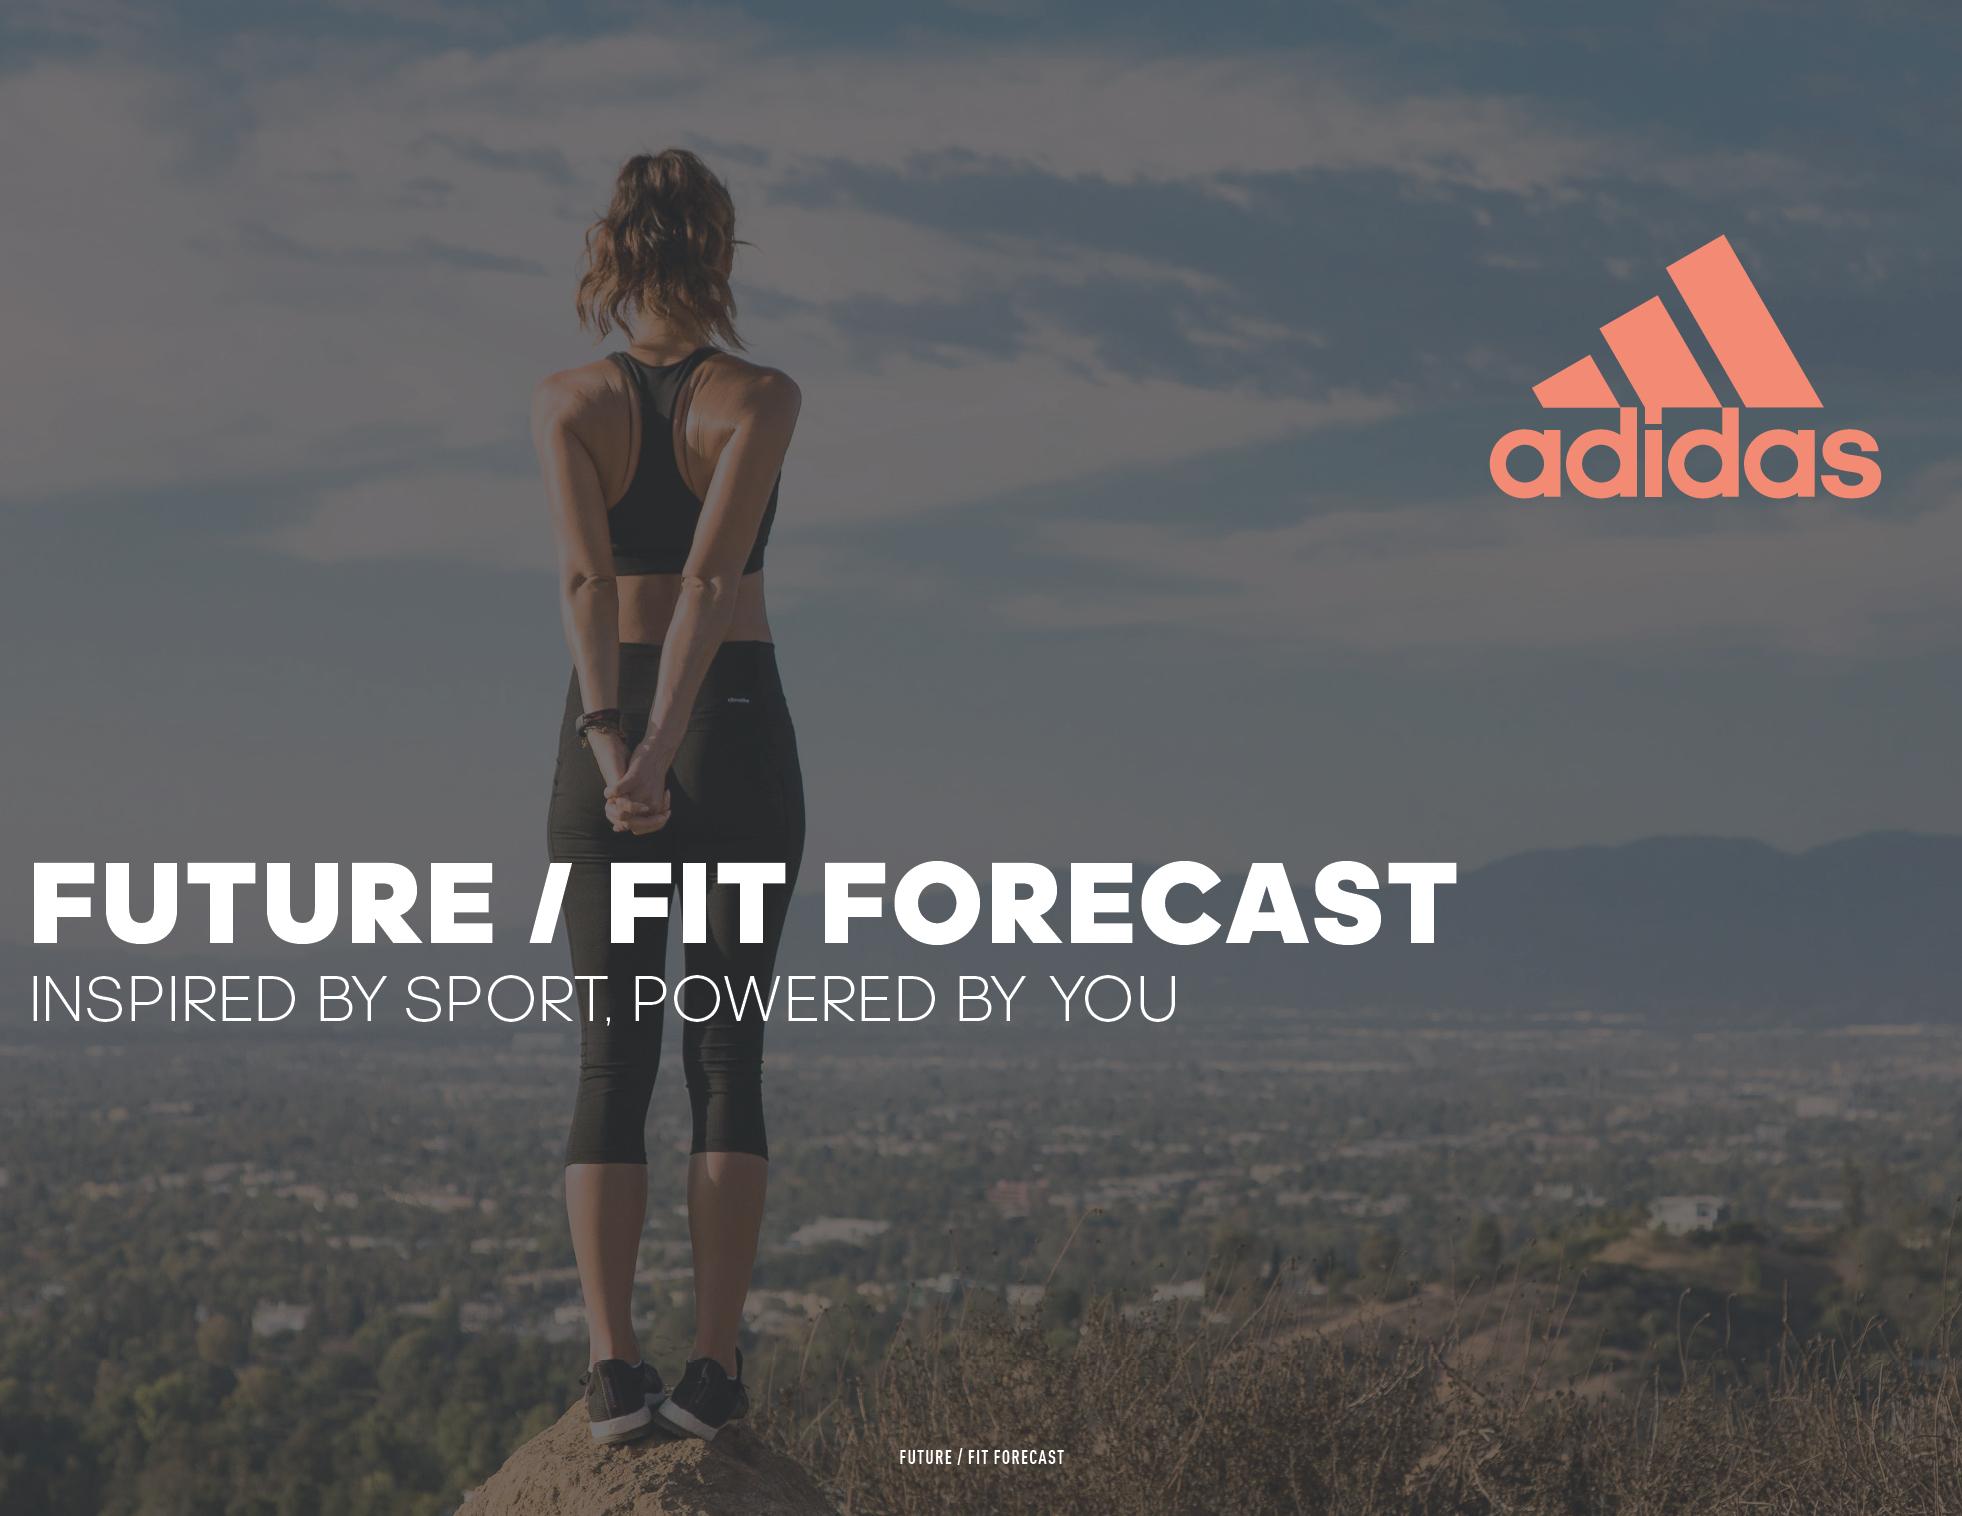 adidas Digital Sports future fit forecast 1